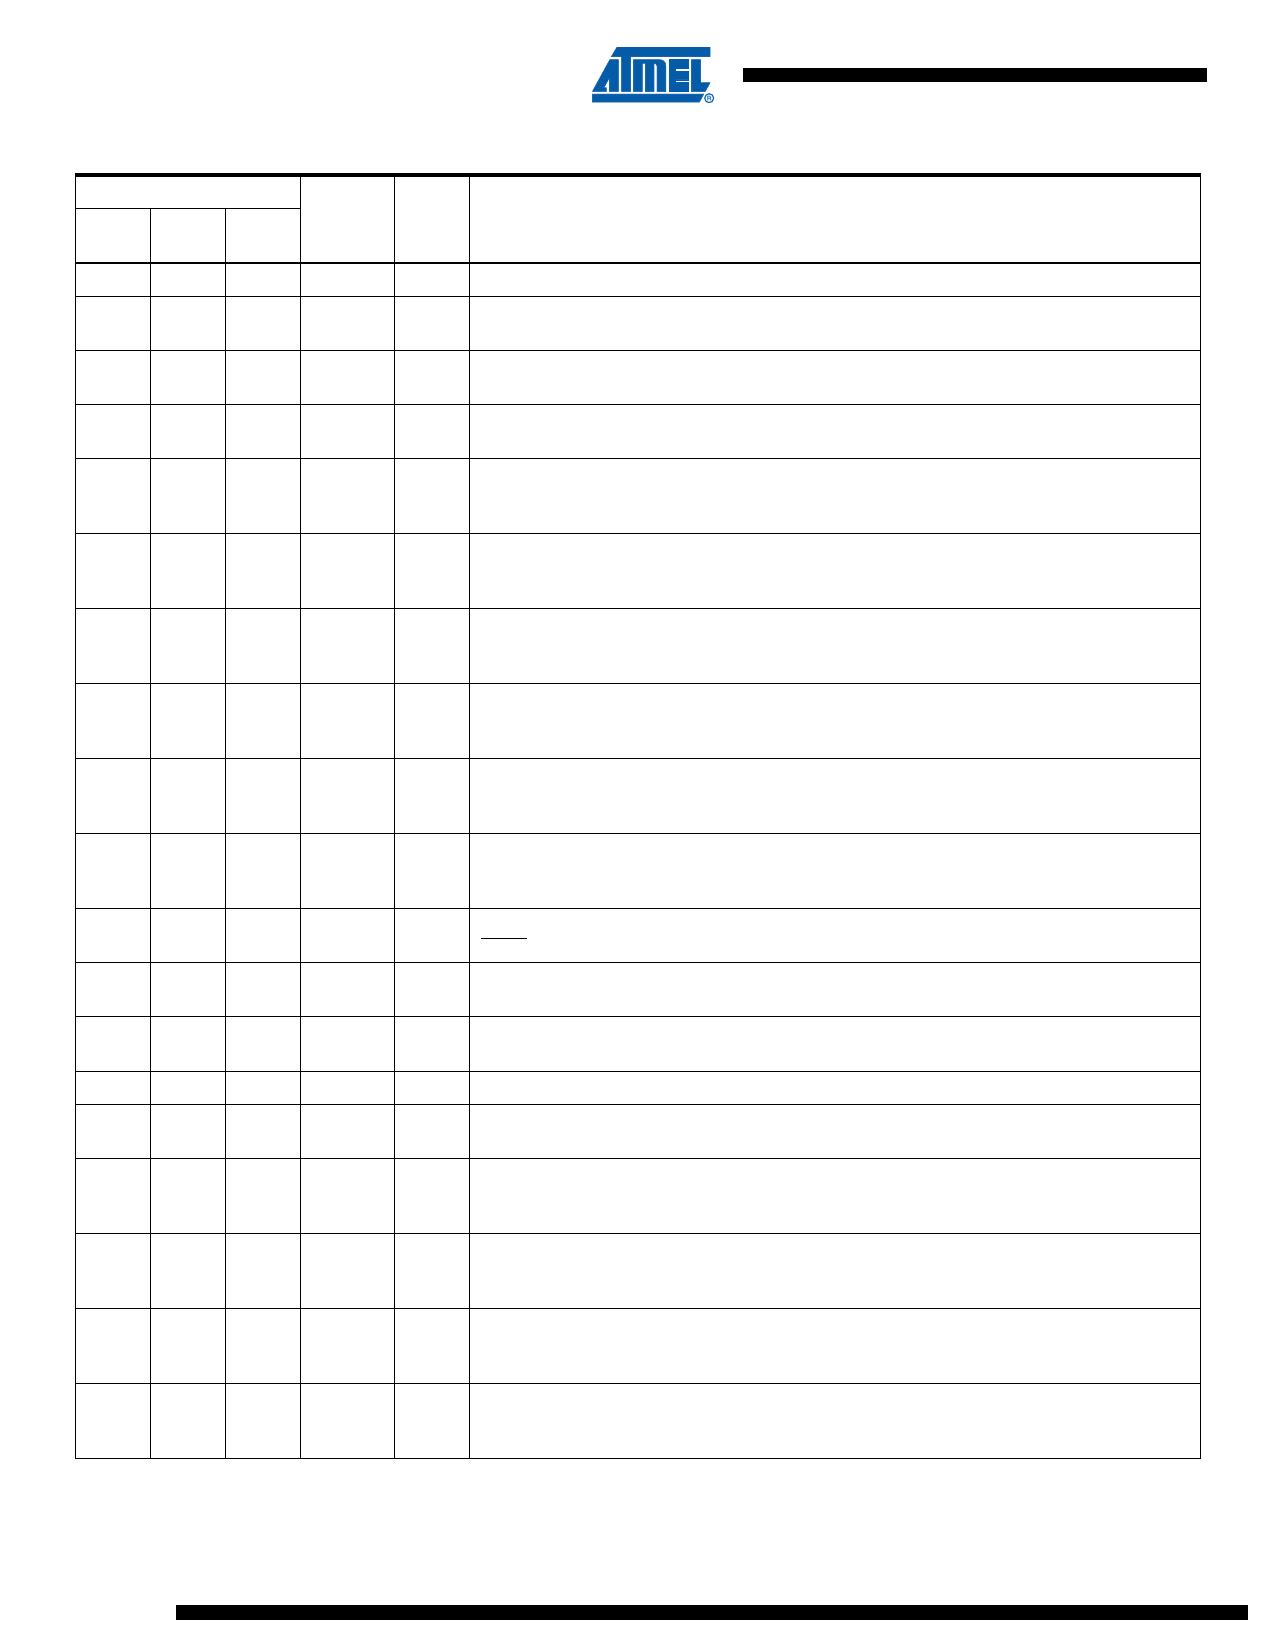 AT89LP51ID2 pdf, 반도체, 판매, 대치품